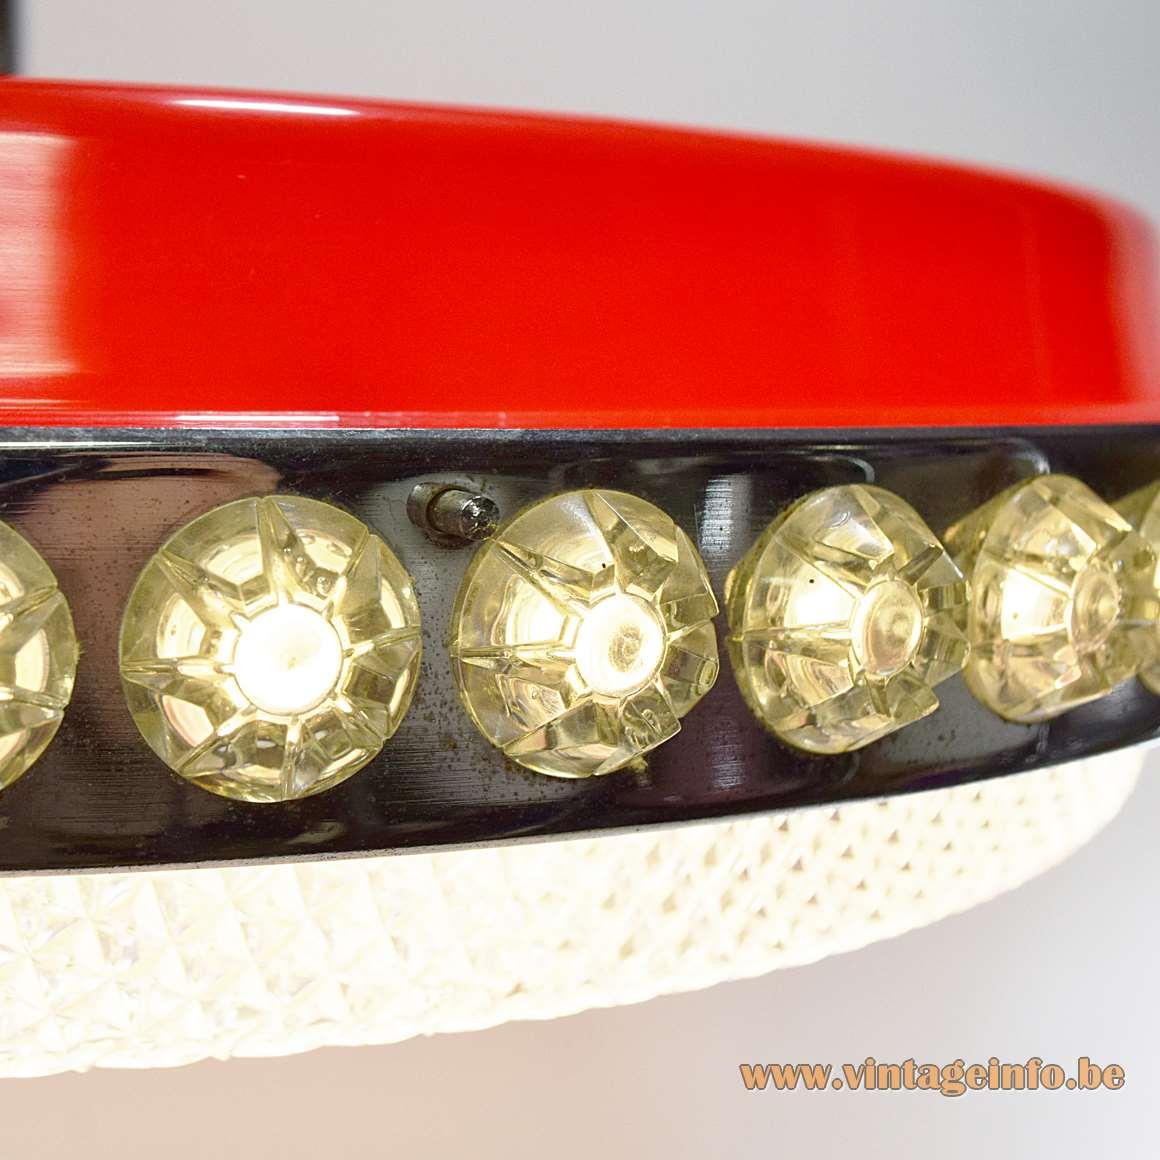 Liro UFO Pendant Lamp plastic stars round fluorescent tube chrome ring 1960s 1970s MCM